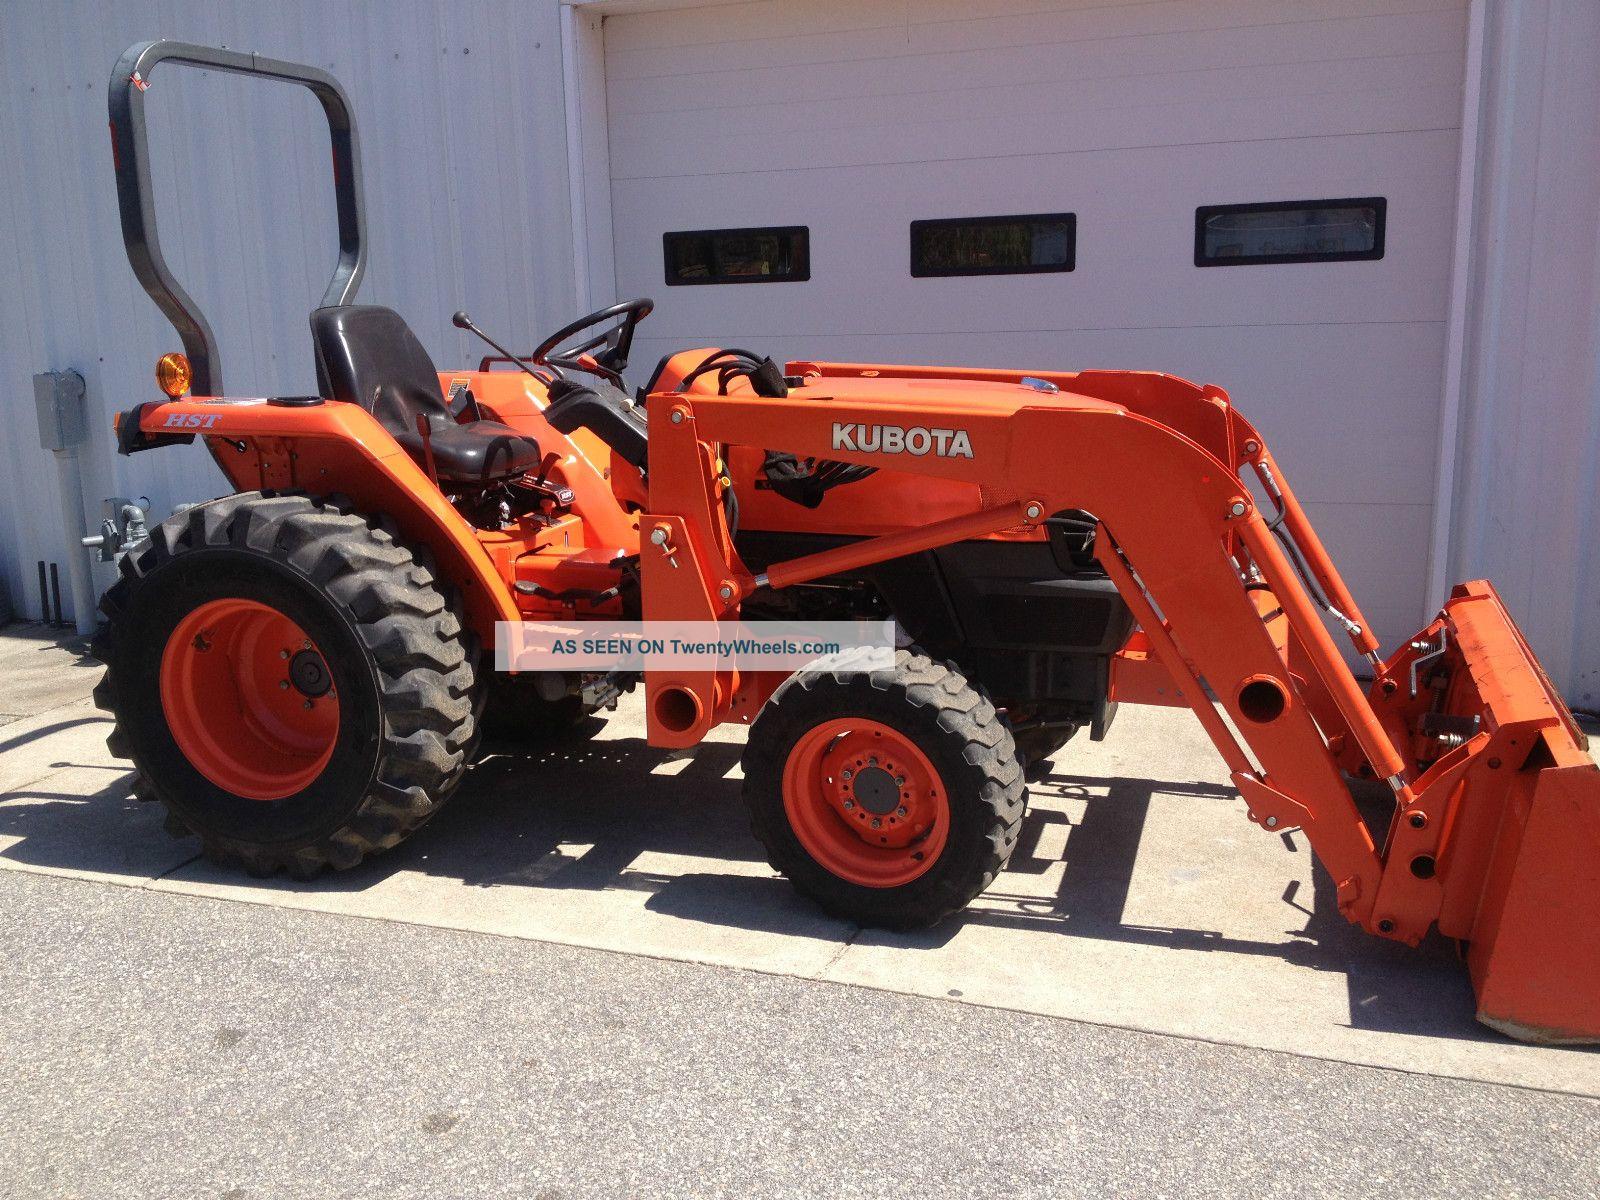 L3400 Kubota Tractor W Loader : Kubota l hst f tractor w loader hydro trans